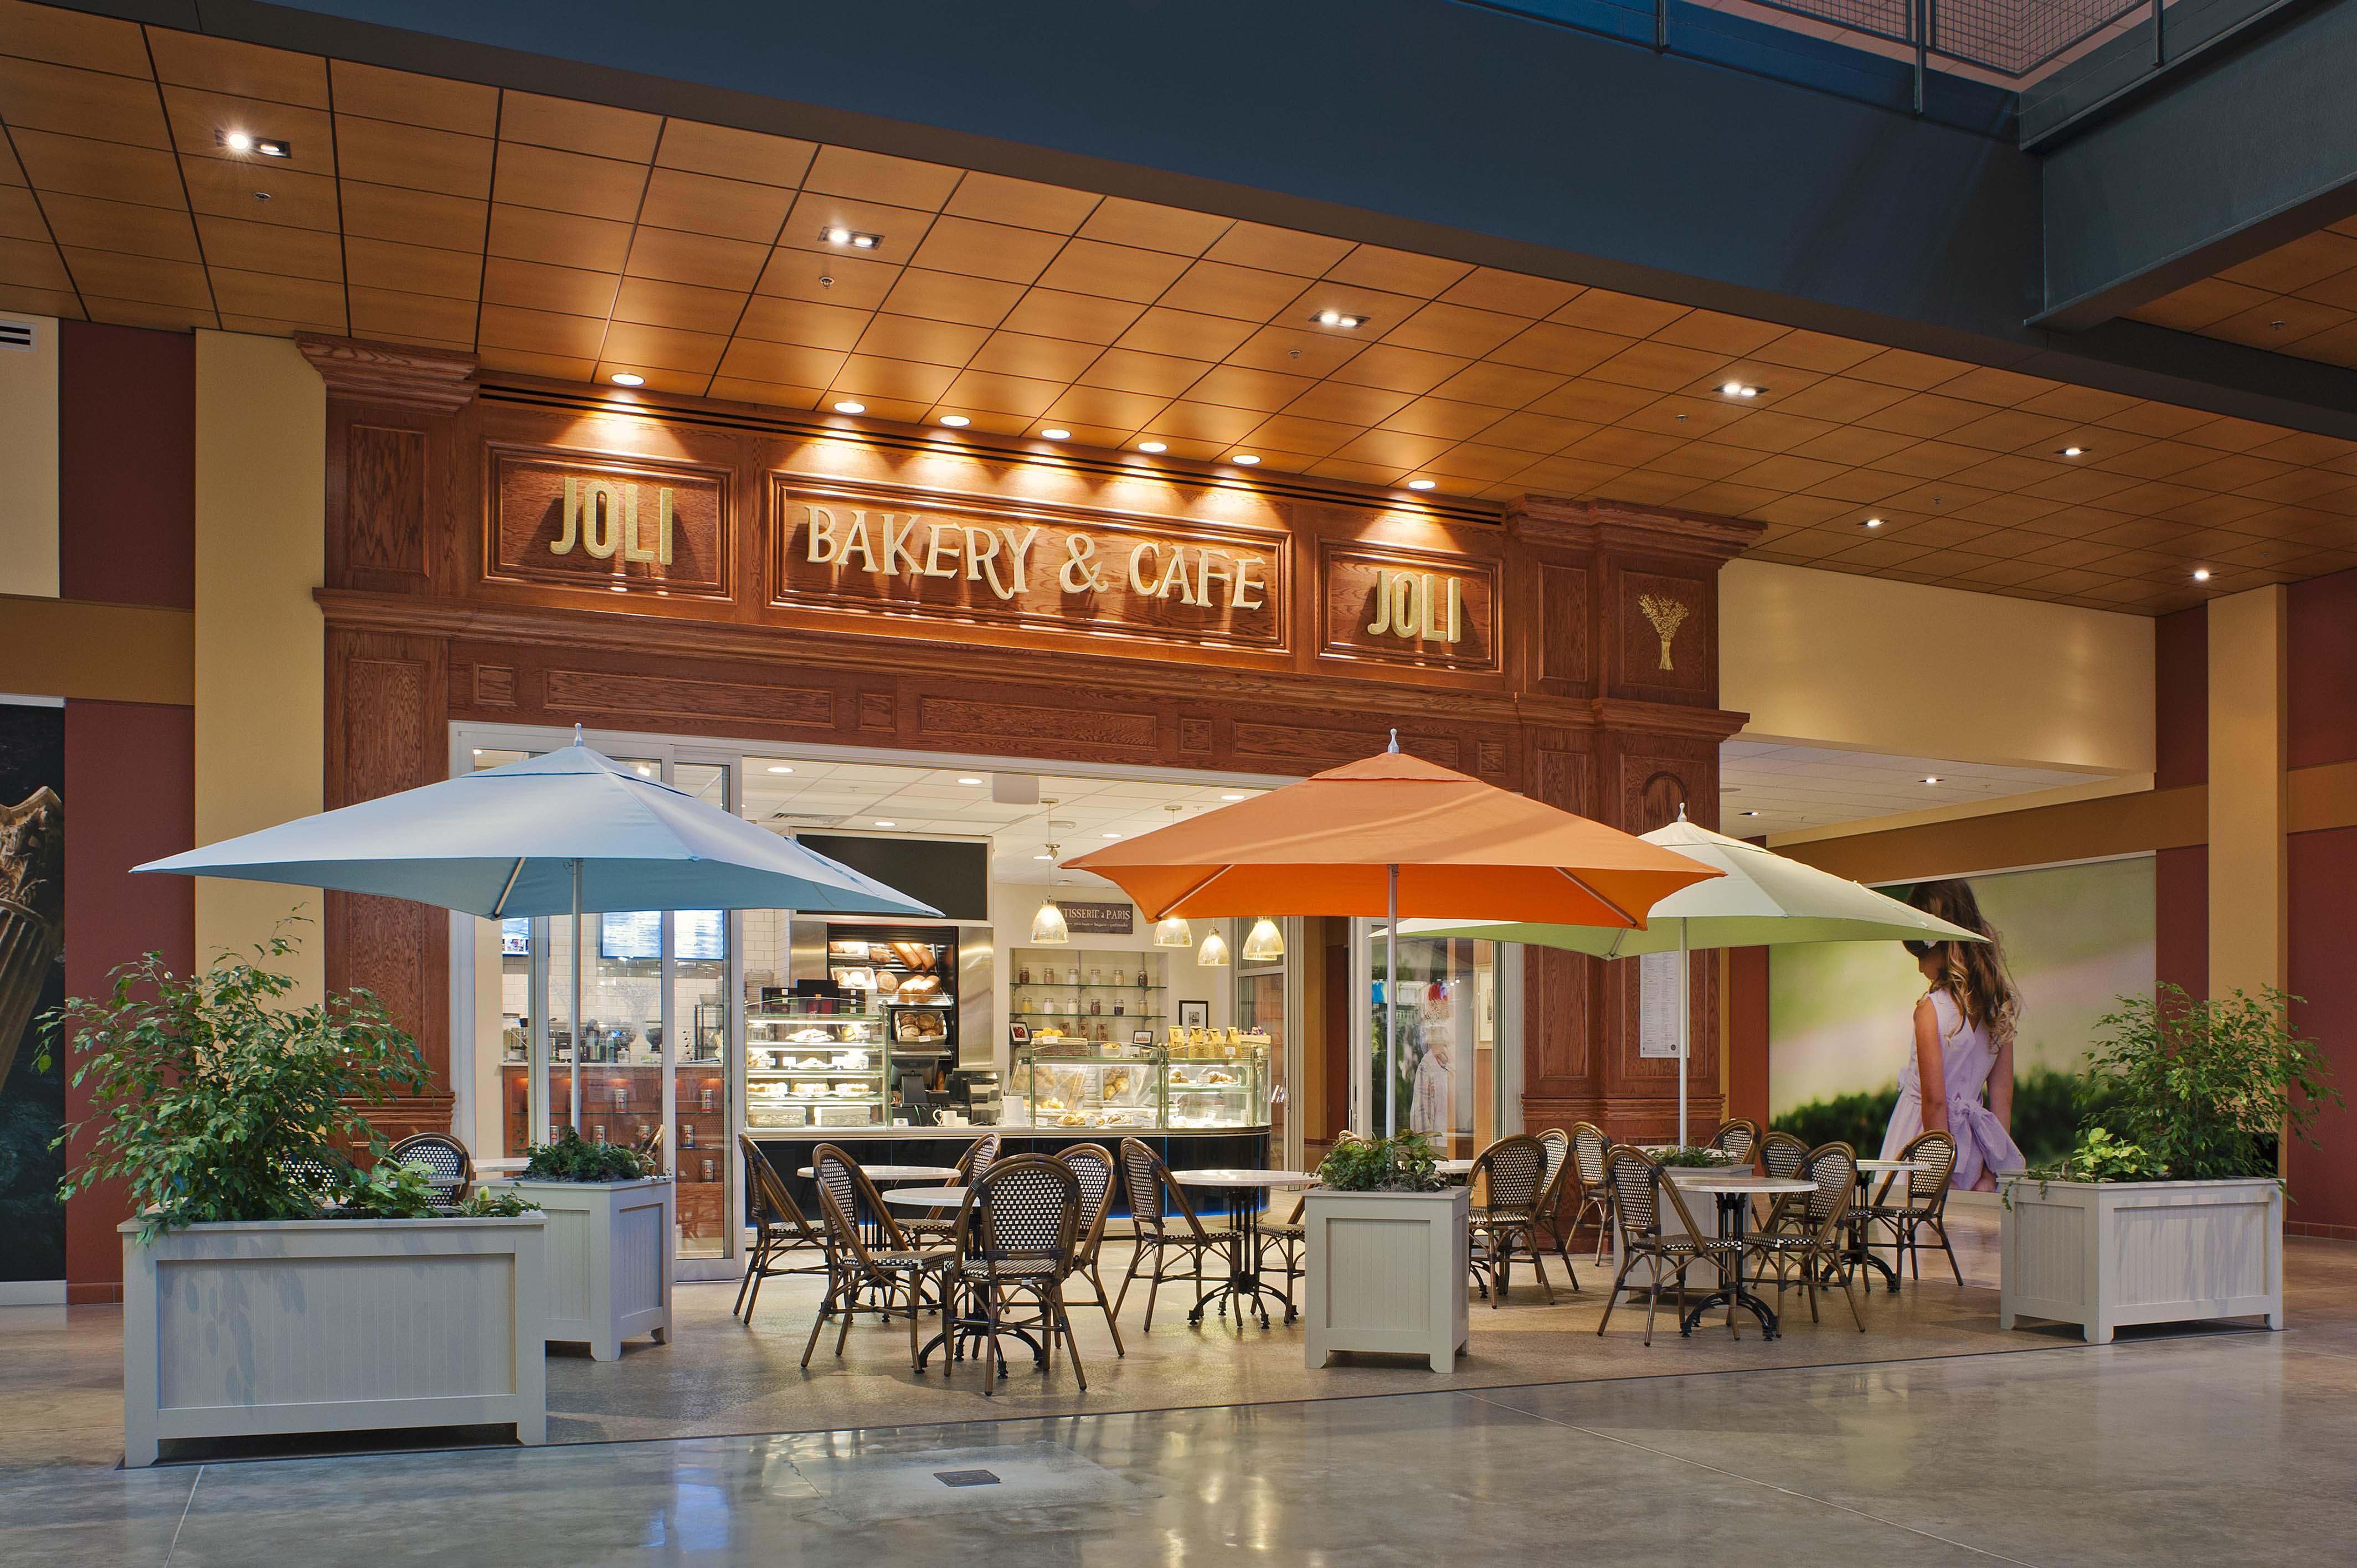 joli bakery & cafe